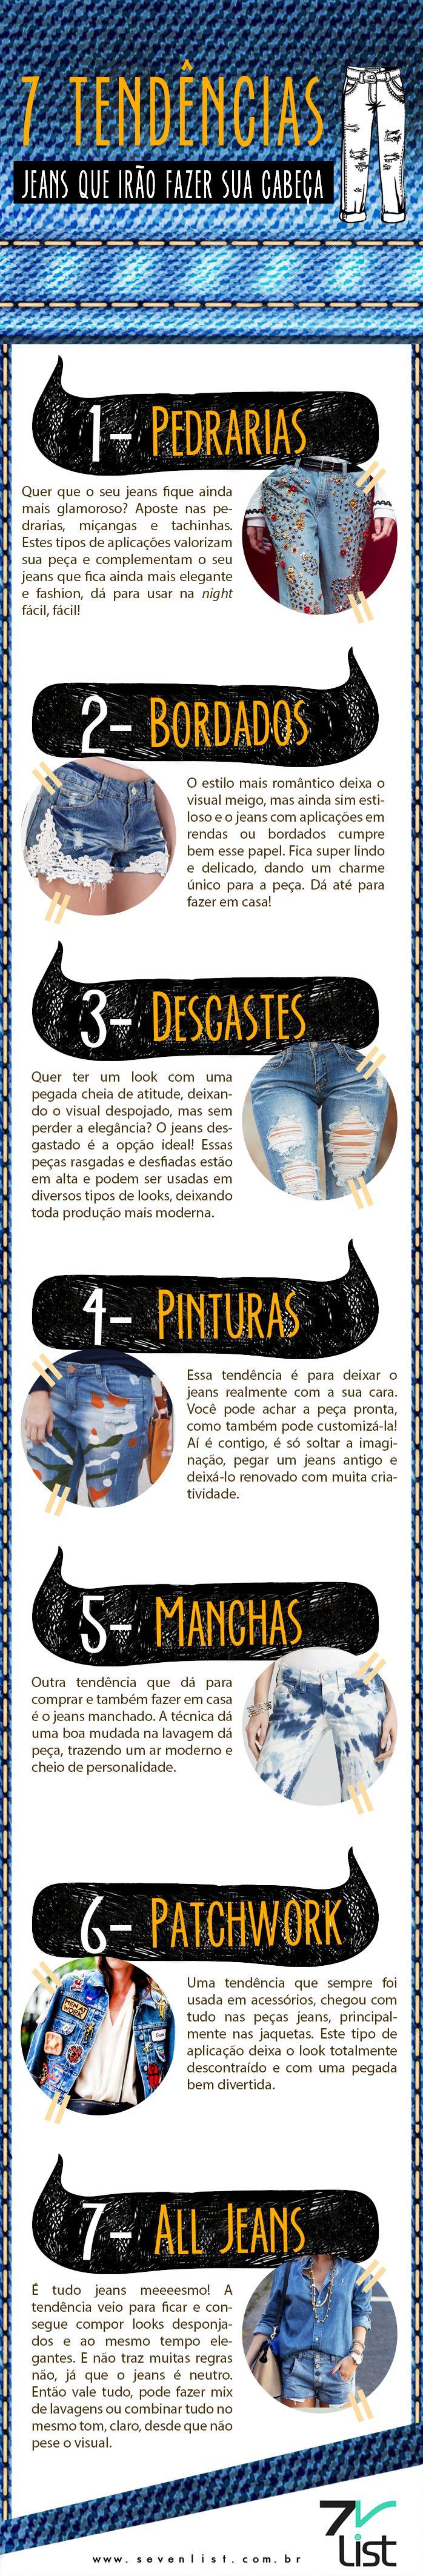 #Sevenlist #Infographic #Infográfico #Design #Moda #Look #Fashion #Alljeans #jeans #Jeanscompedrarias #Jeanscombordados #Jeanscomdesgastes #Jeanscompinturas #Jeanscommanchas #Jeanscompatchworks #Alljeans #Fashion #Moda www.sevenlist.com.br